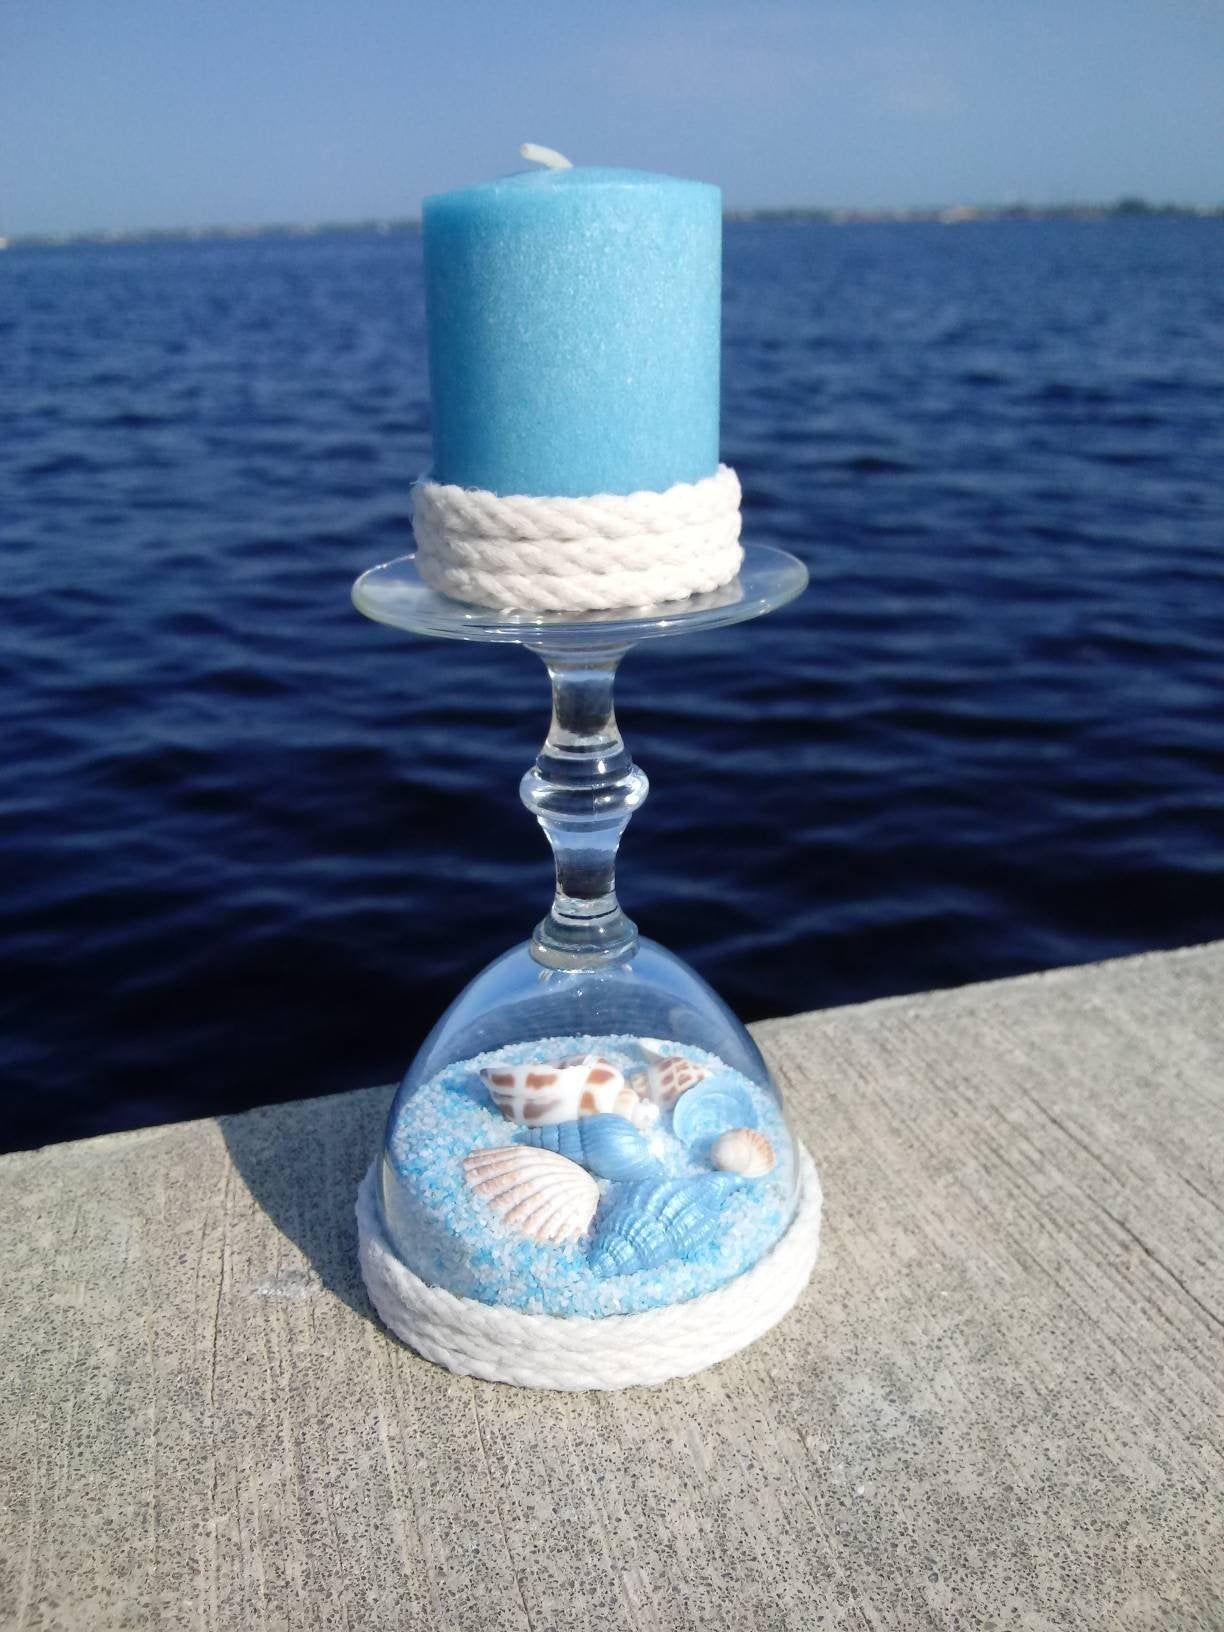 Mini Upcycled Glass Candle Holder Seashells Beachy Home Decor Turquoise Candle Holder Wedding Decor Housew Wine Glass Candle Holder Candle Holders Candles